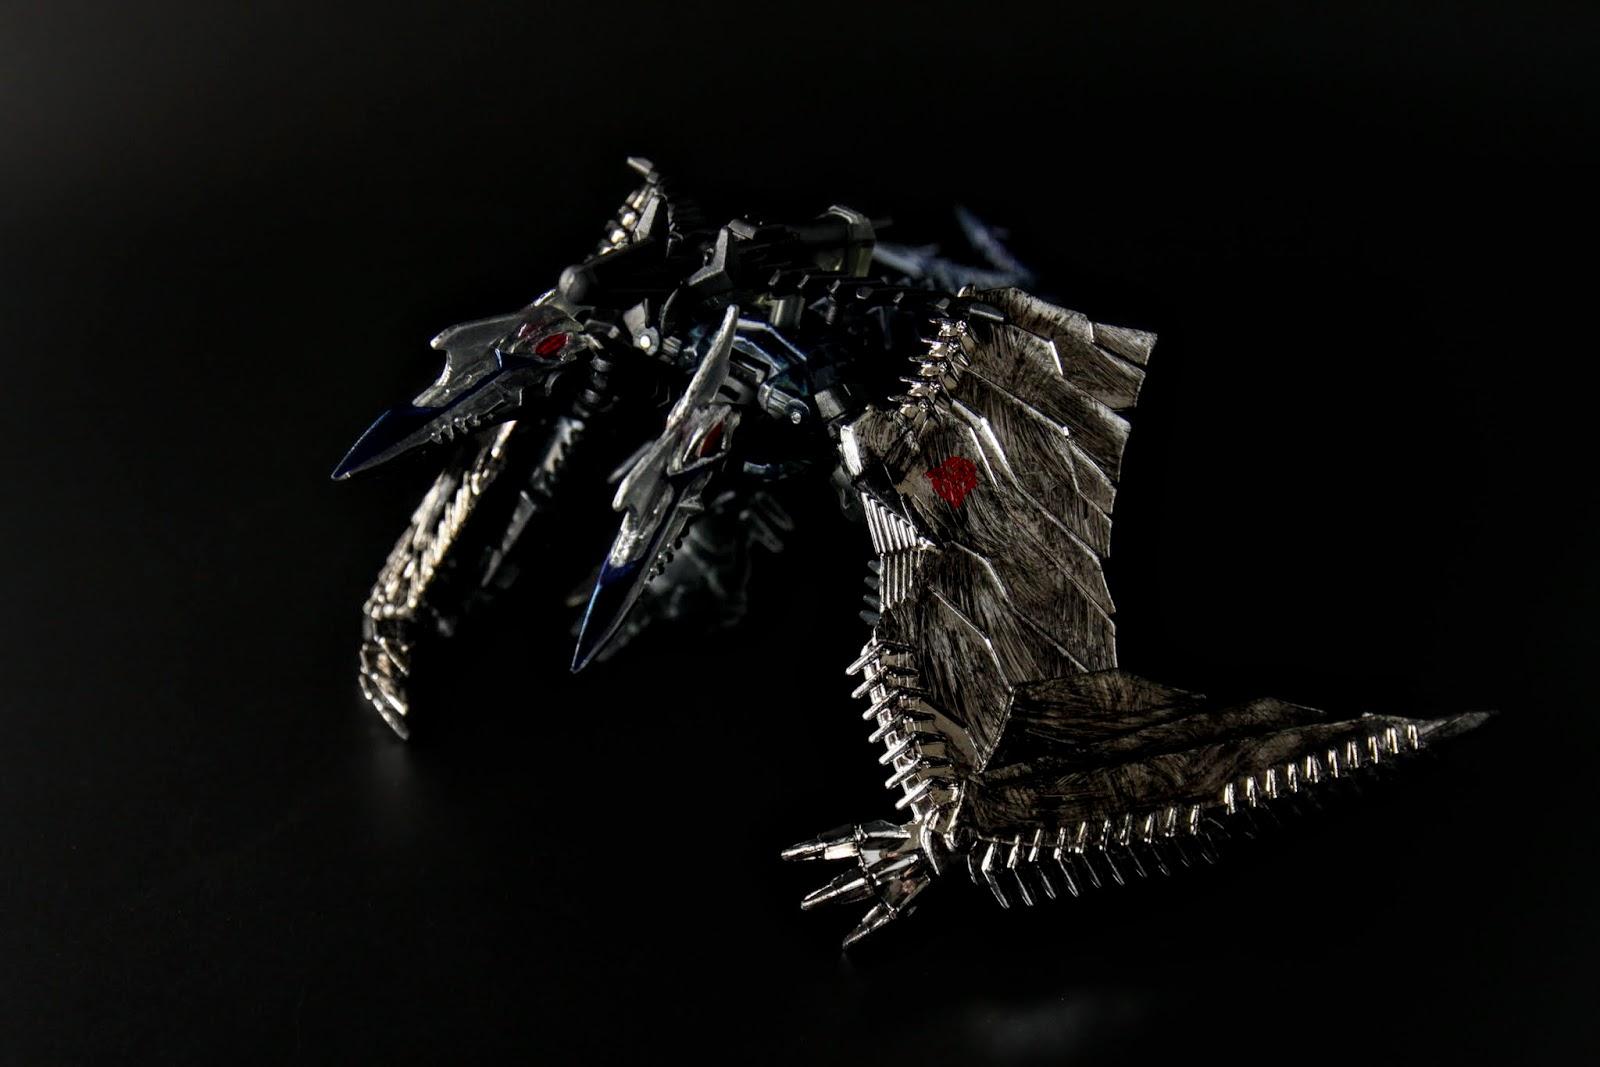 Strafe,外型是翼龍,但是是雙頭的